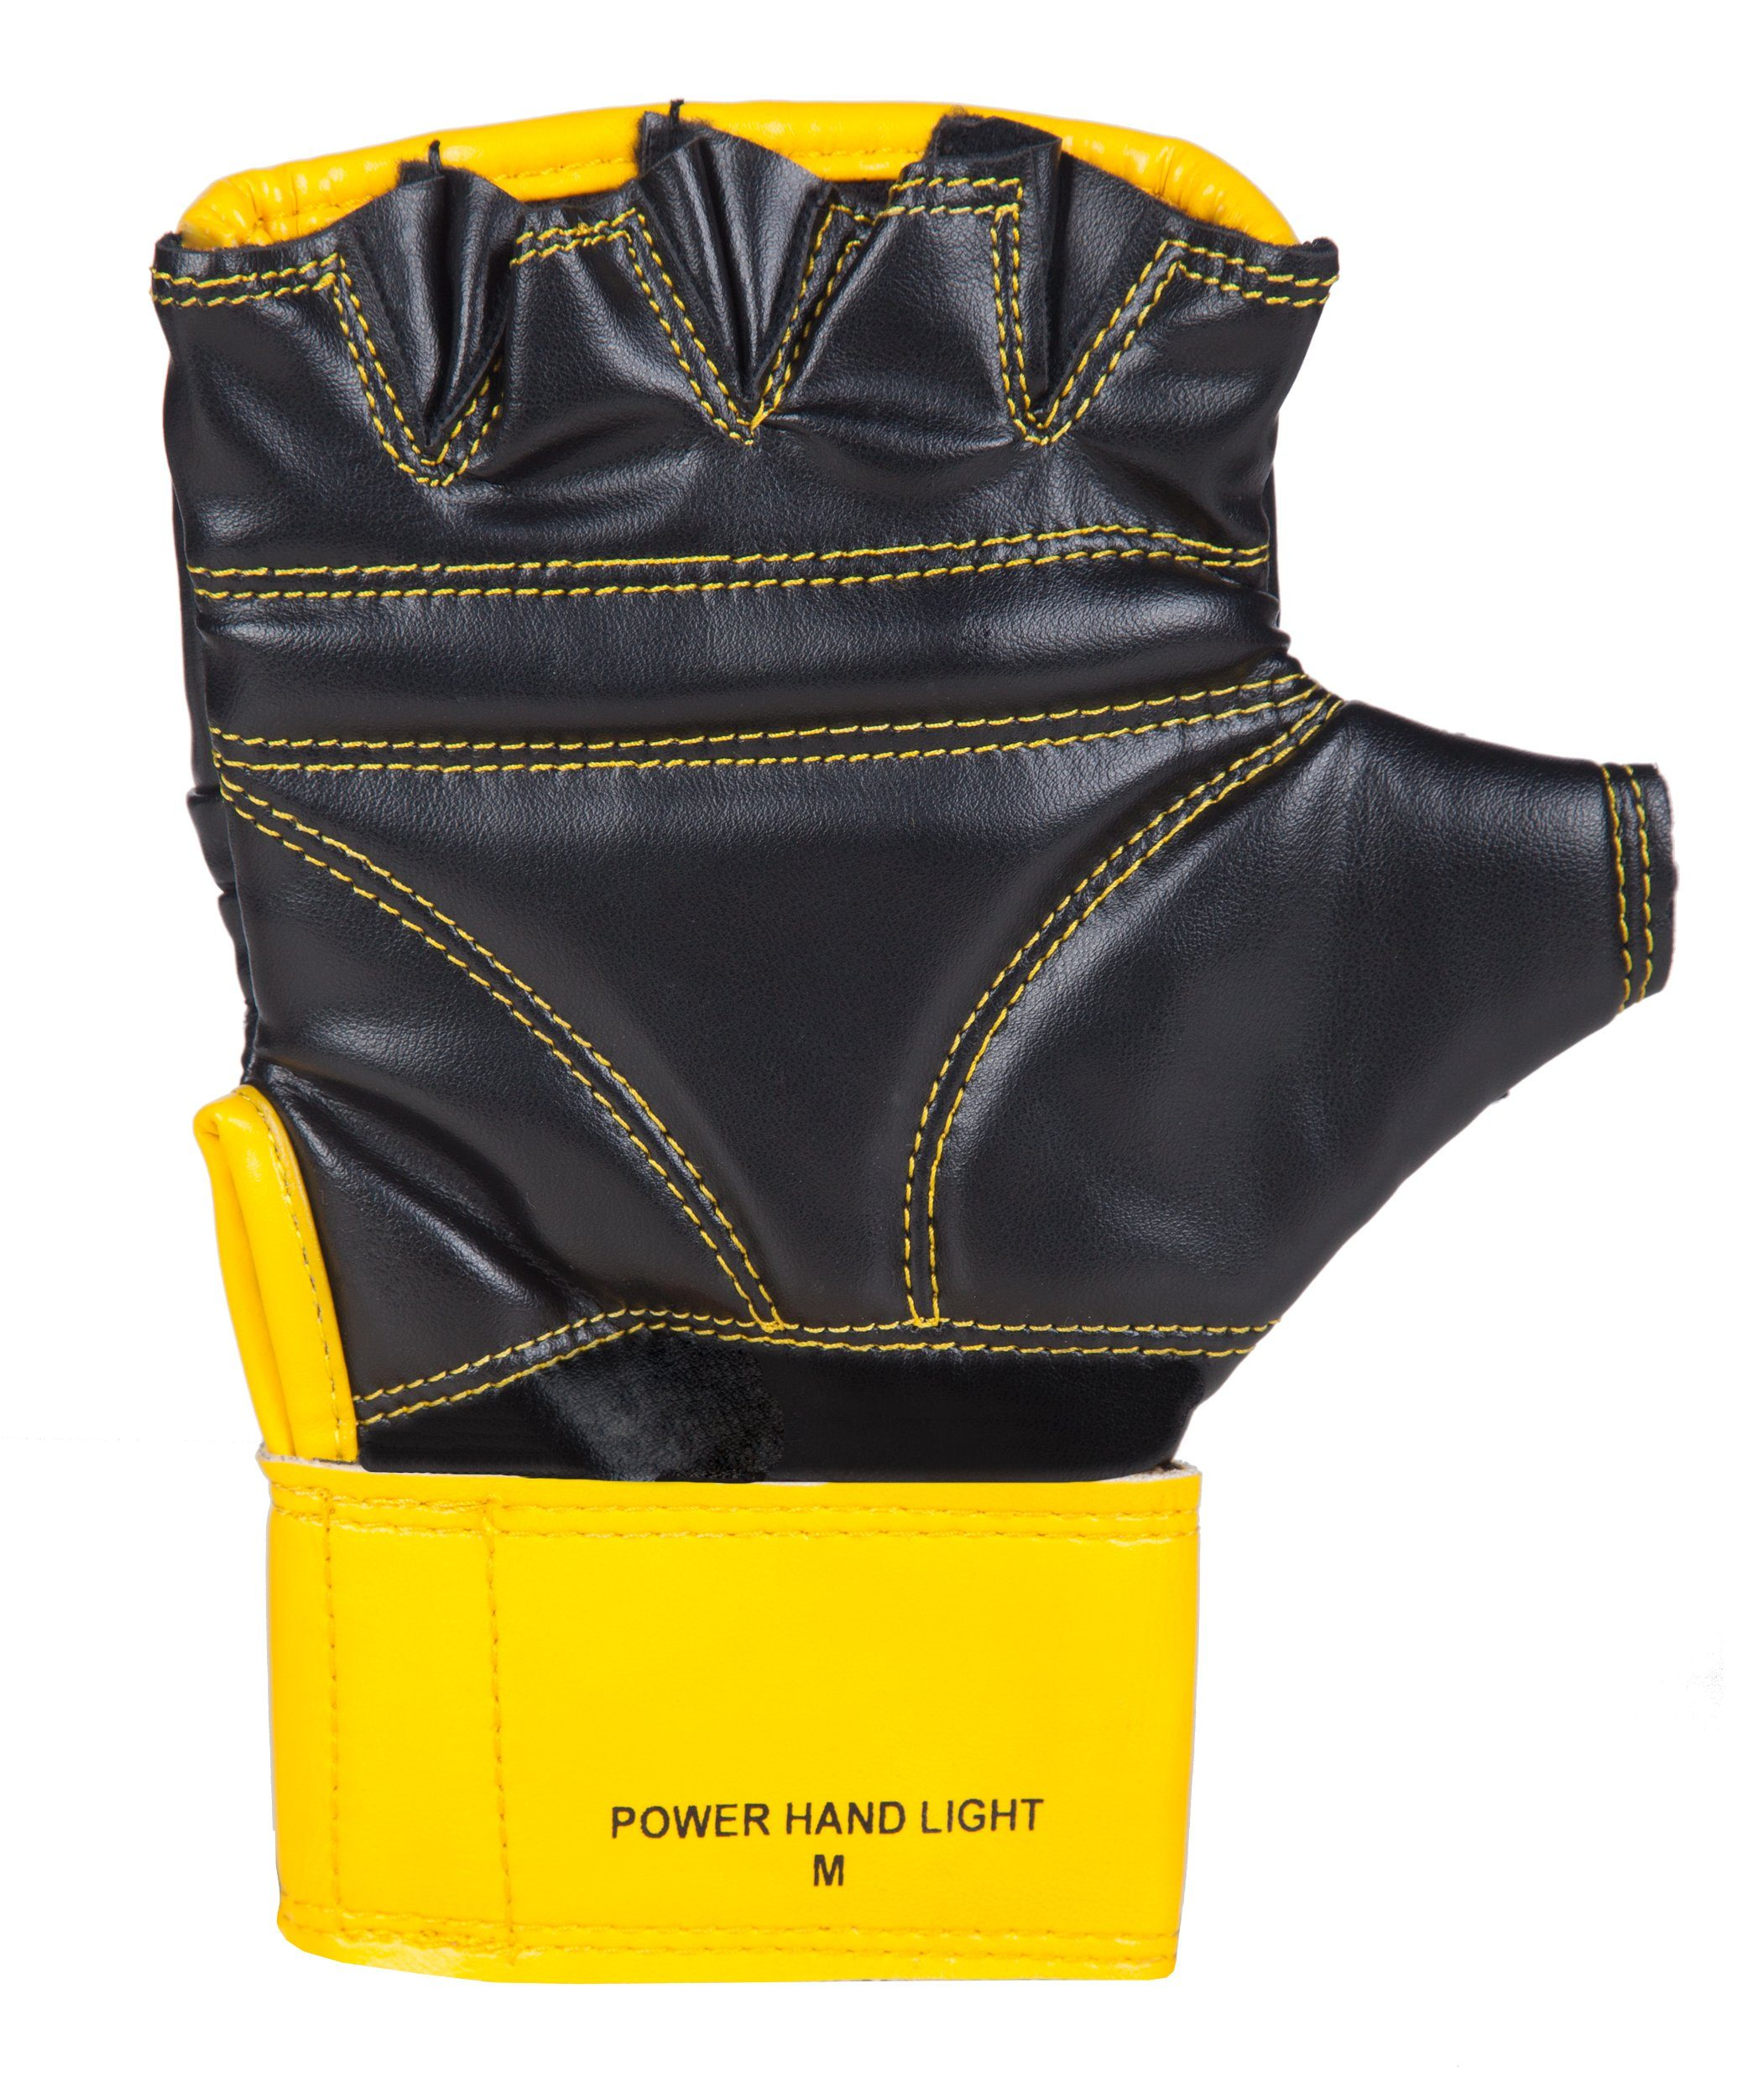 Benlee Rocky Marciano Handschuhe in sportlichem Design POWER HAND LIGHT | Accessoires > Handschuhe > Sonstige Handschuhe | Benlee Rocky Marciano